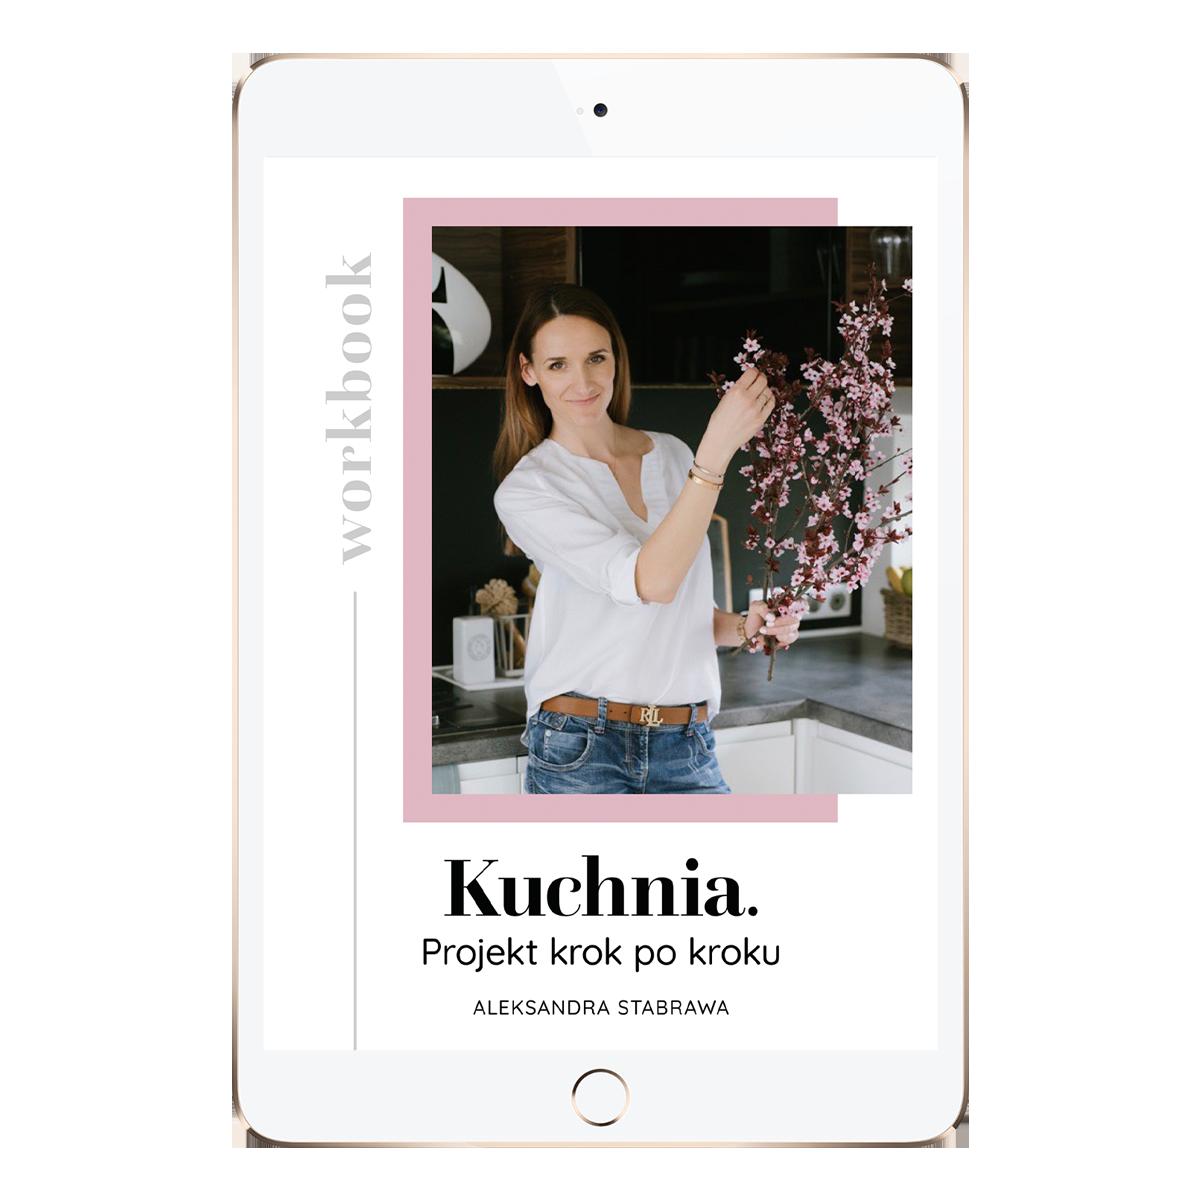 workBook_Kuchnia_Projekt_krok_po_kroku_stabrawa_ebook